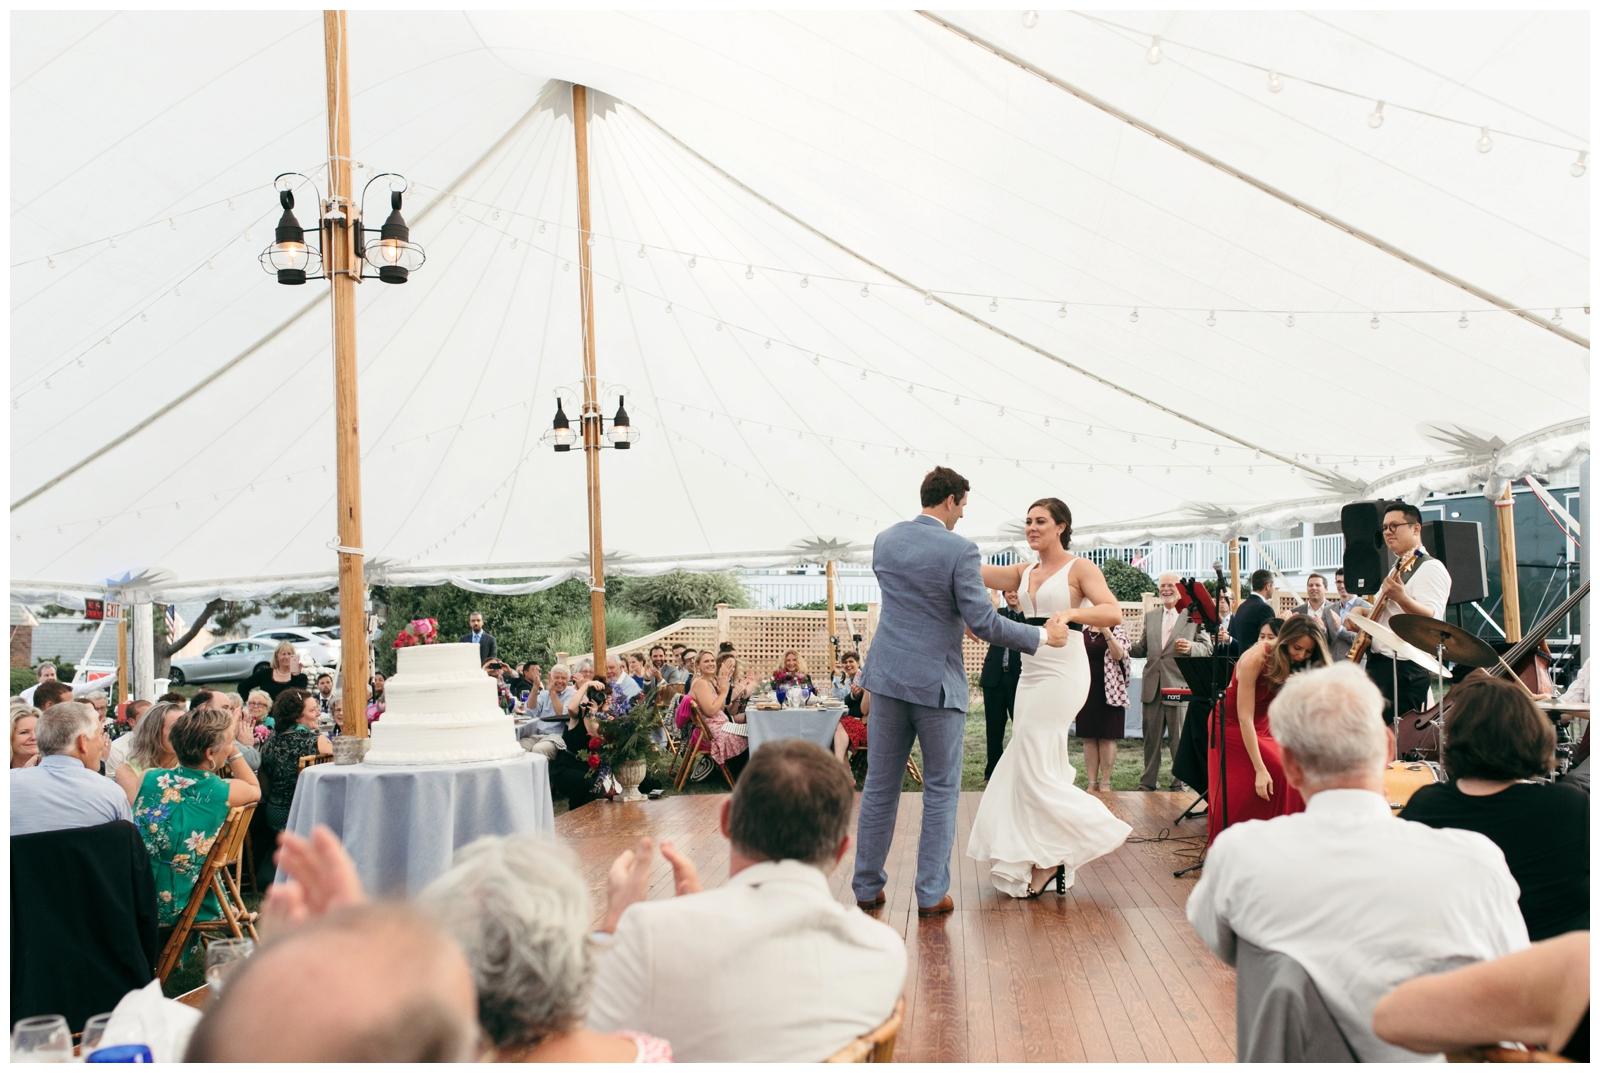 Bailey-Q-Photo-Backyard-Wedding-South-Shore-Boston-Wedding-Photographer-096.jpg